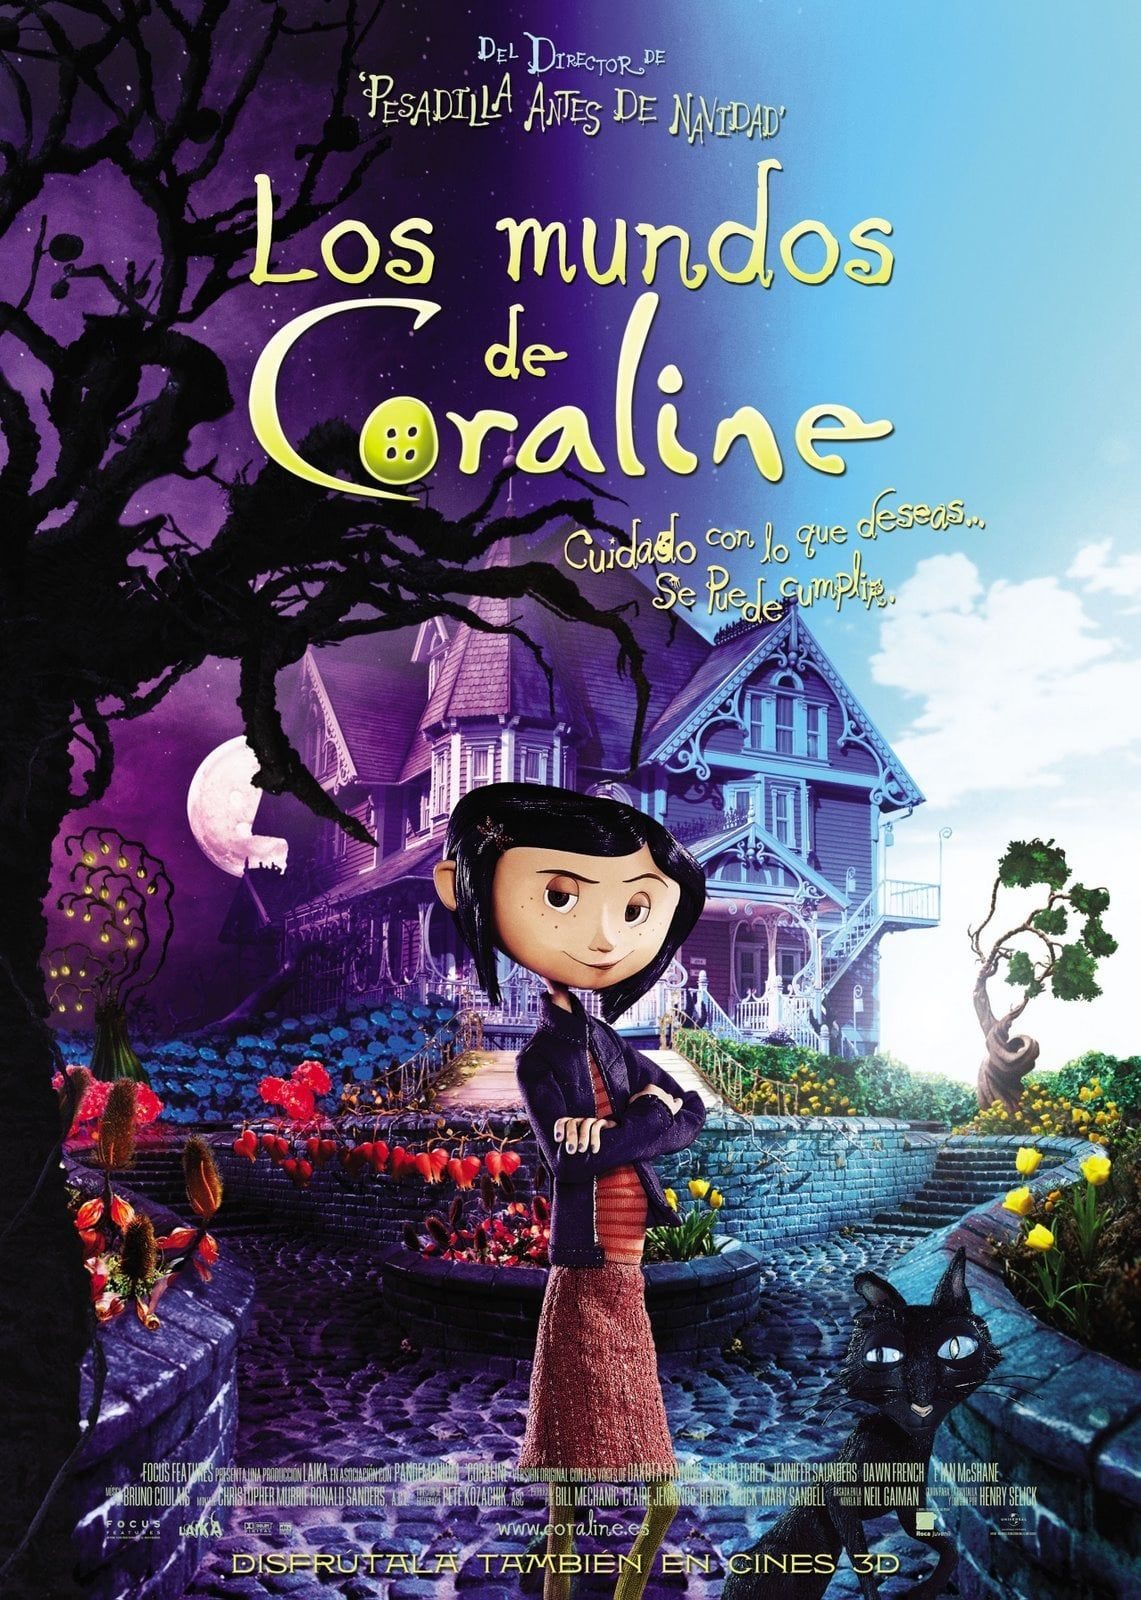 Ver Hd Coraline 2009 Pelicula Completa Gratis Online En Espanol Latino Coraline Movie Coraline Film Coraline Art